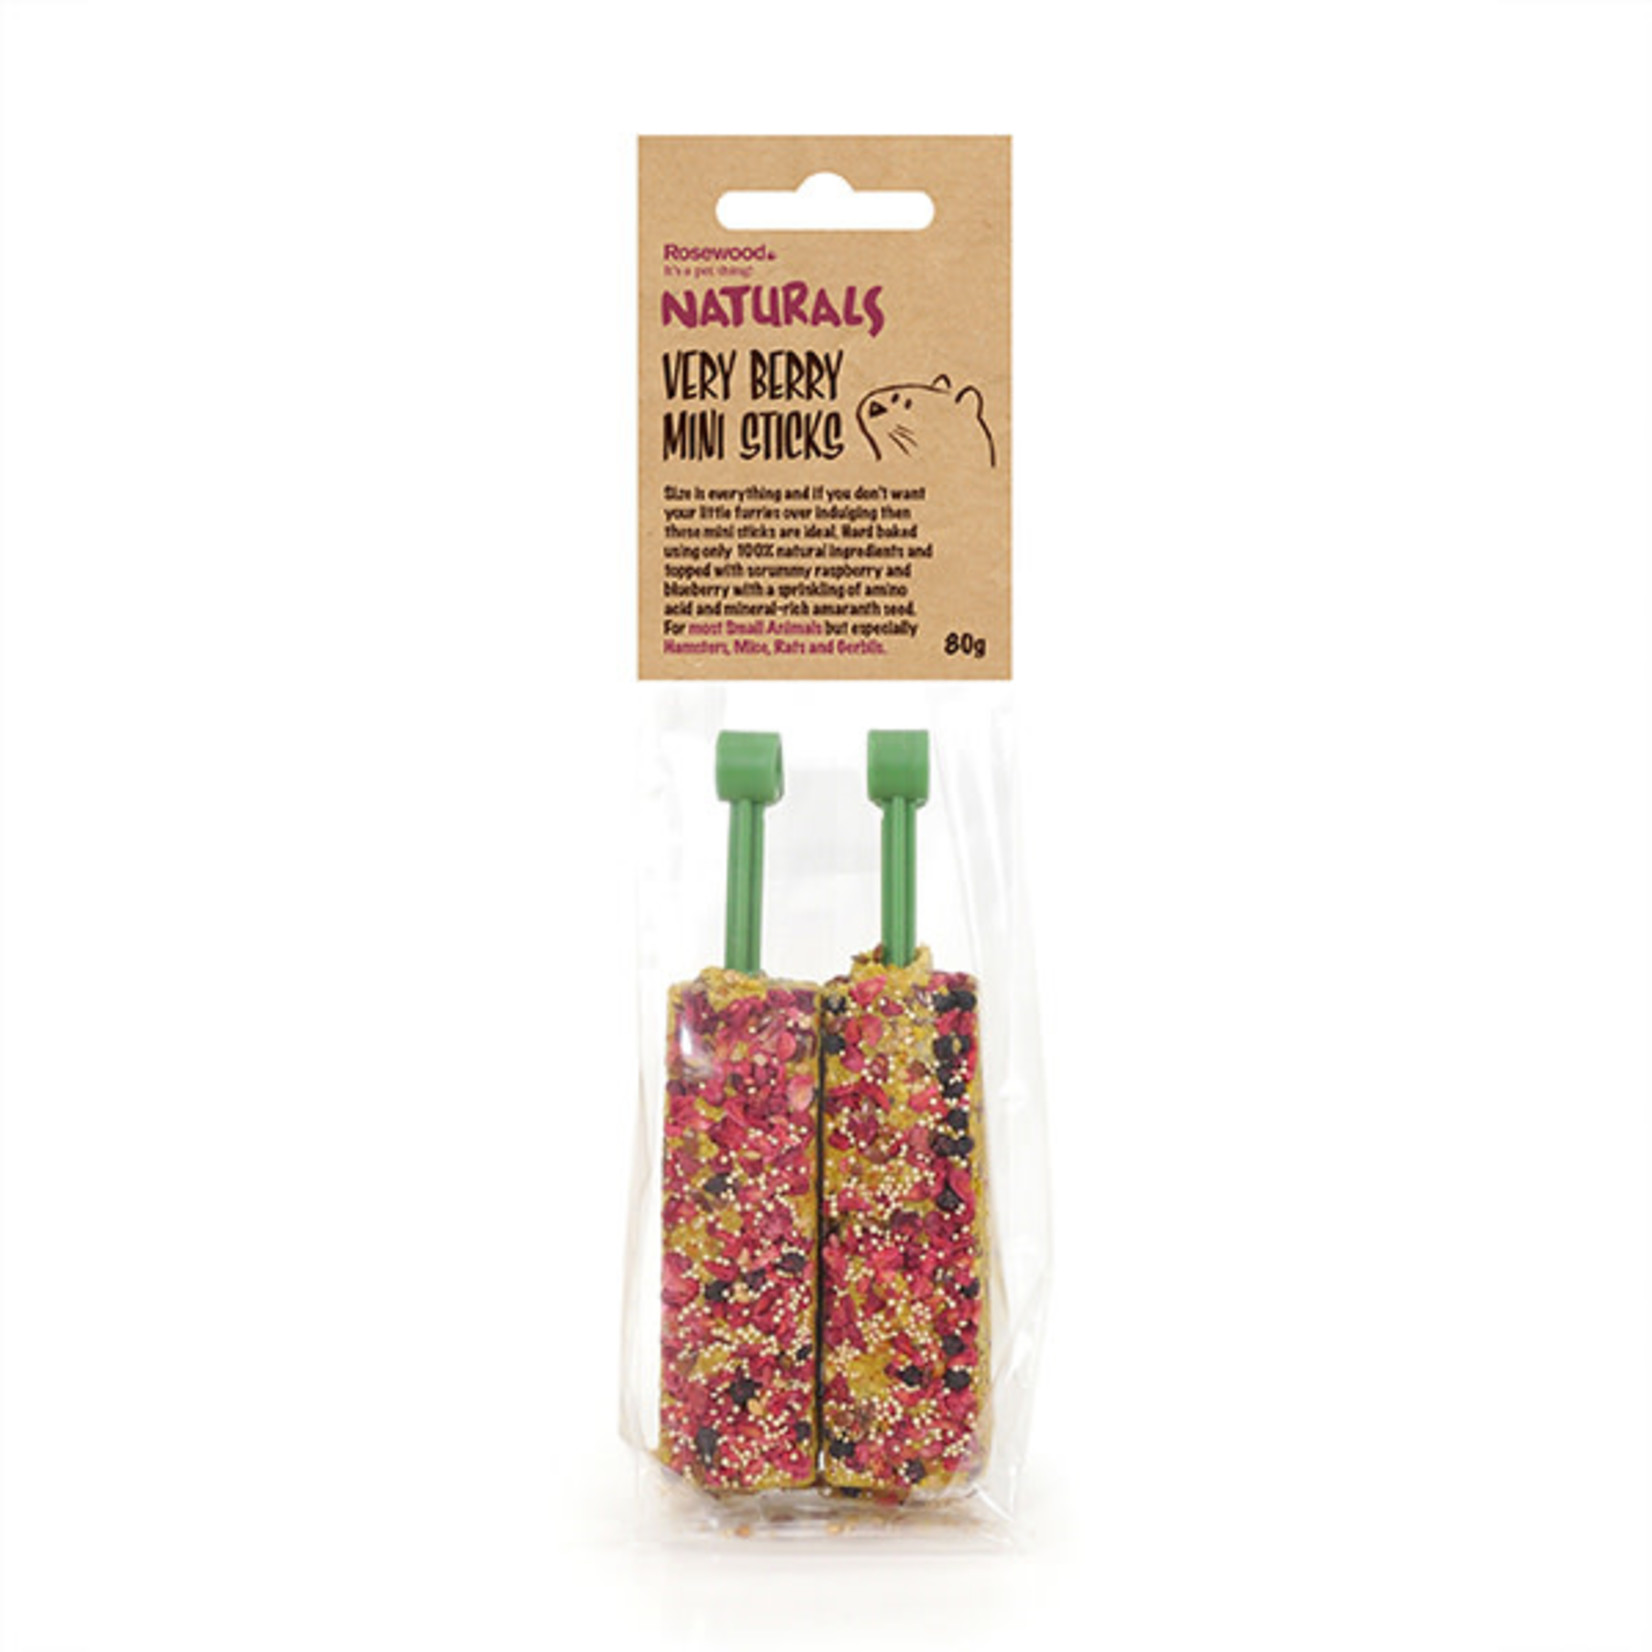 Rosewood Boredom Breaker Naturals Very Berry Mini Sticks Small Animal Treat, 2 pack